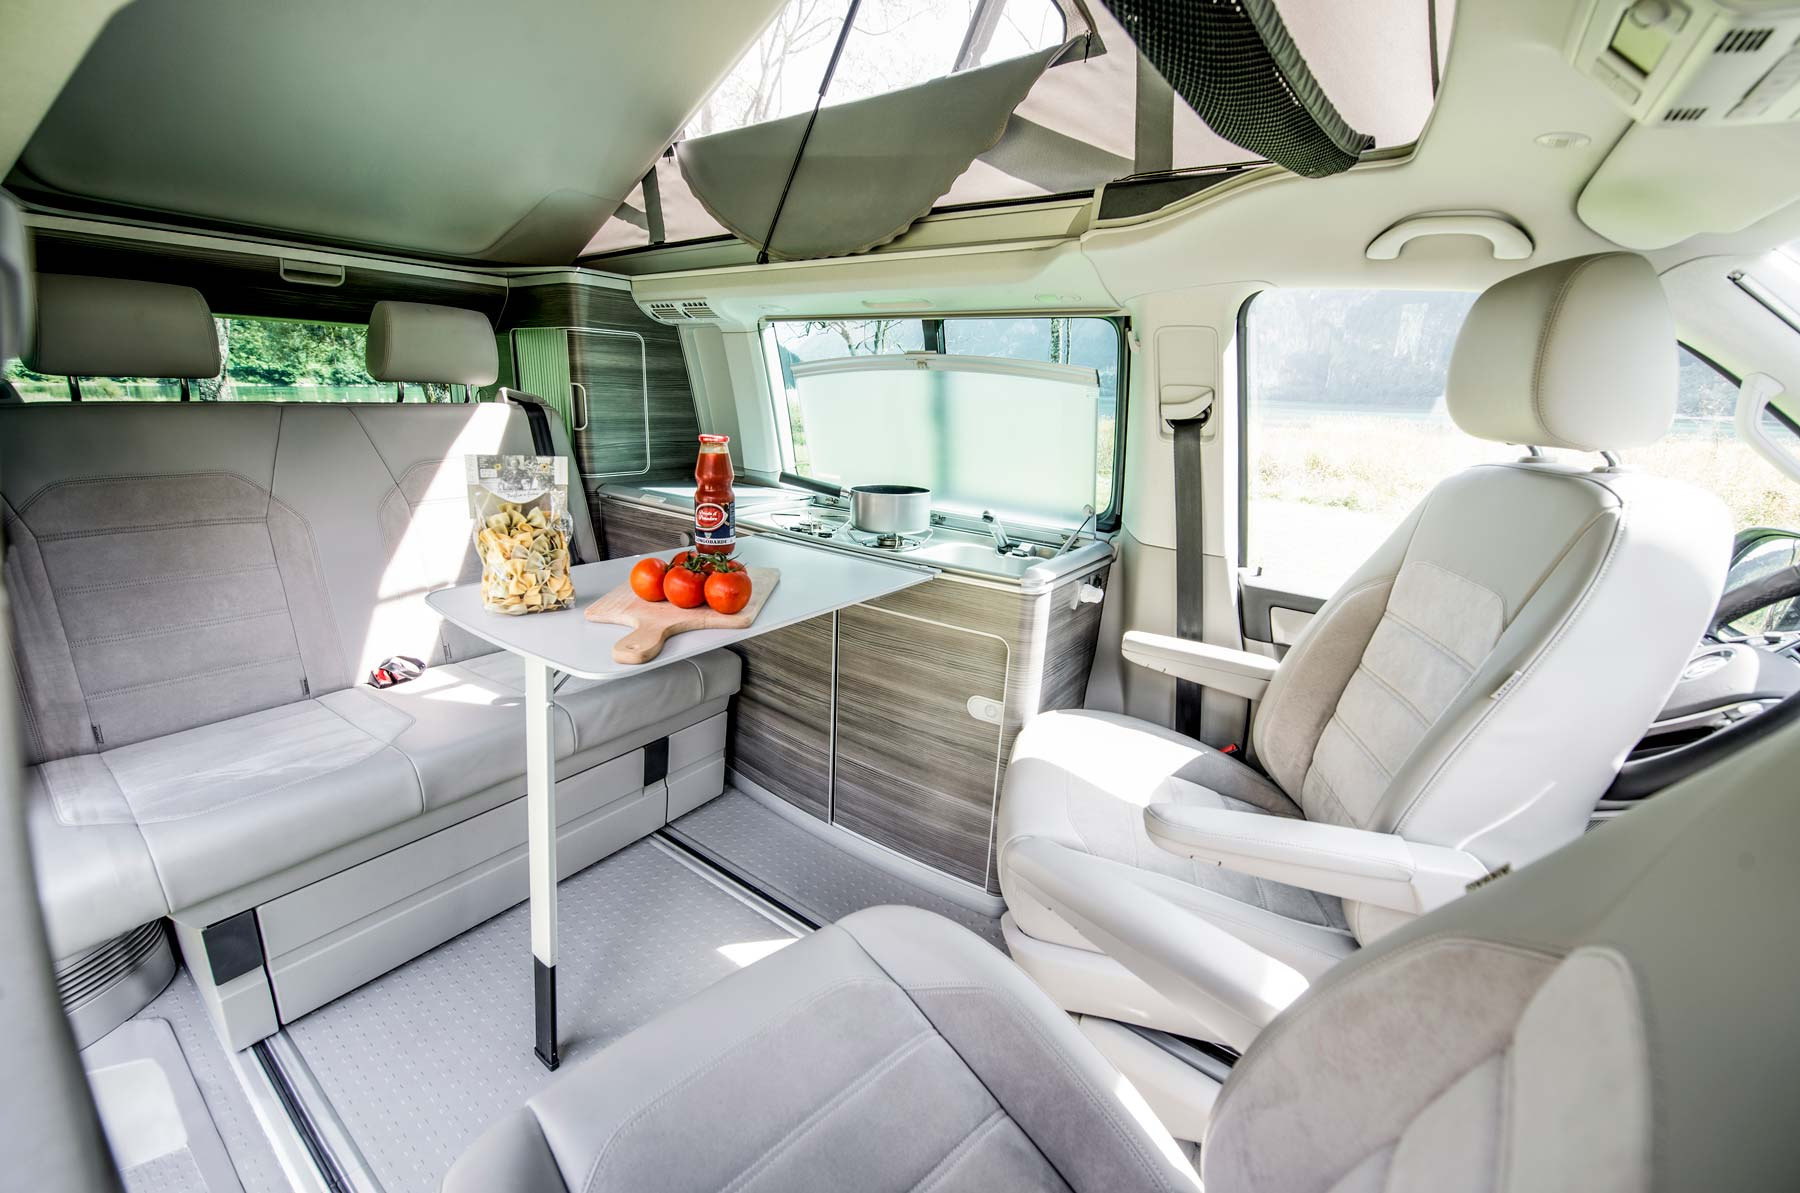 Camper mieten Schweiz, VW T6 California Ocean, Dach offen, Kochen, Sitzgelegenheiten